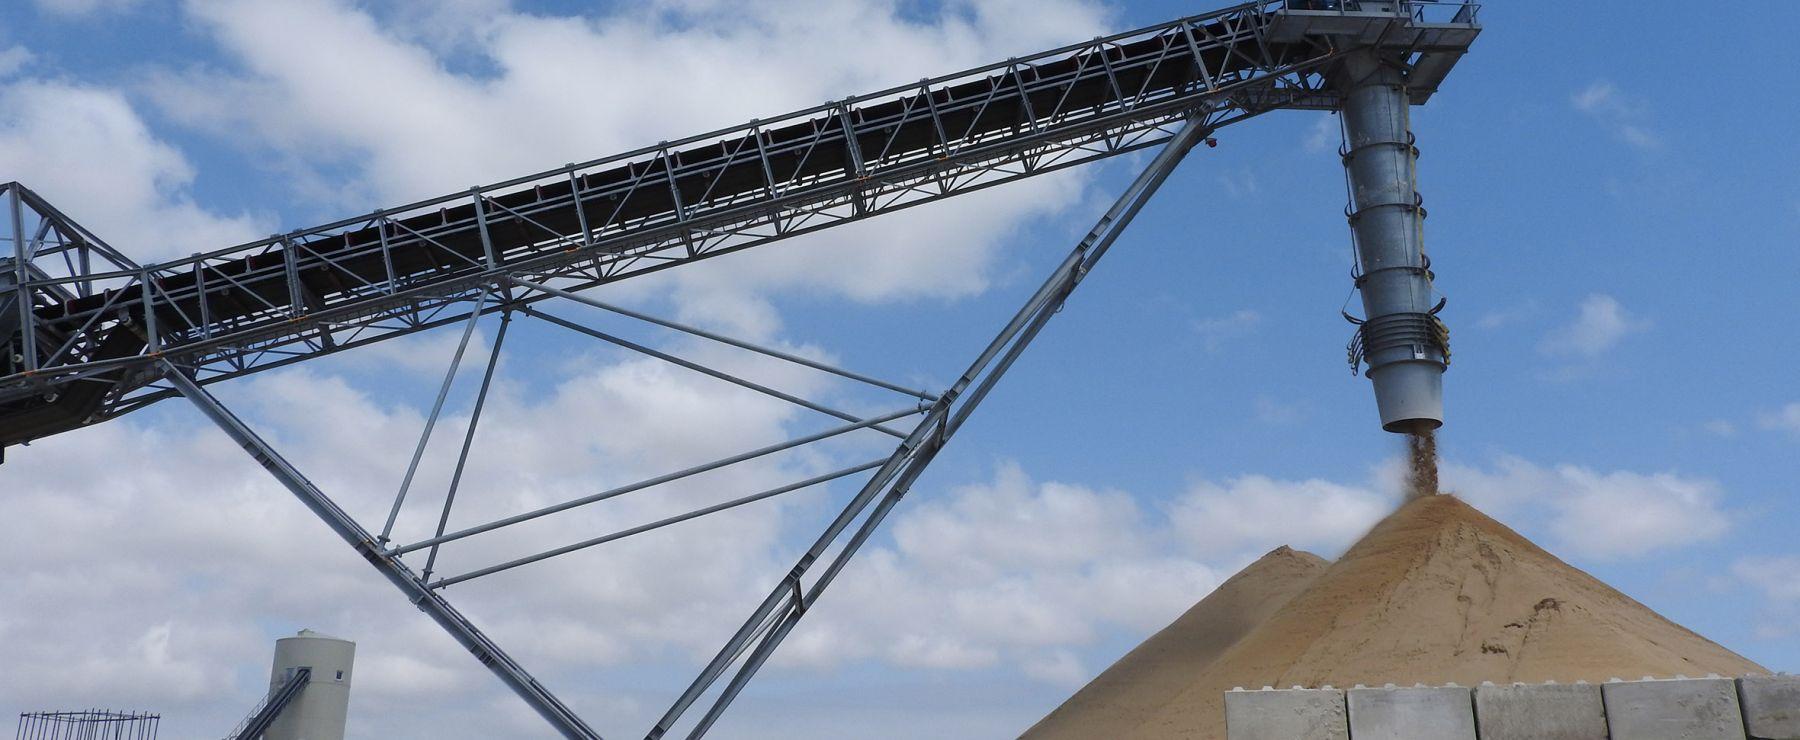 Belt Conveyors For Waste Management And Bulk Material Handling N M